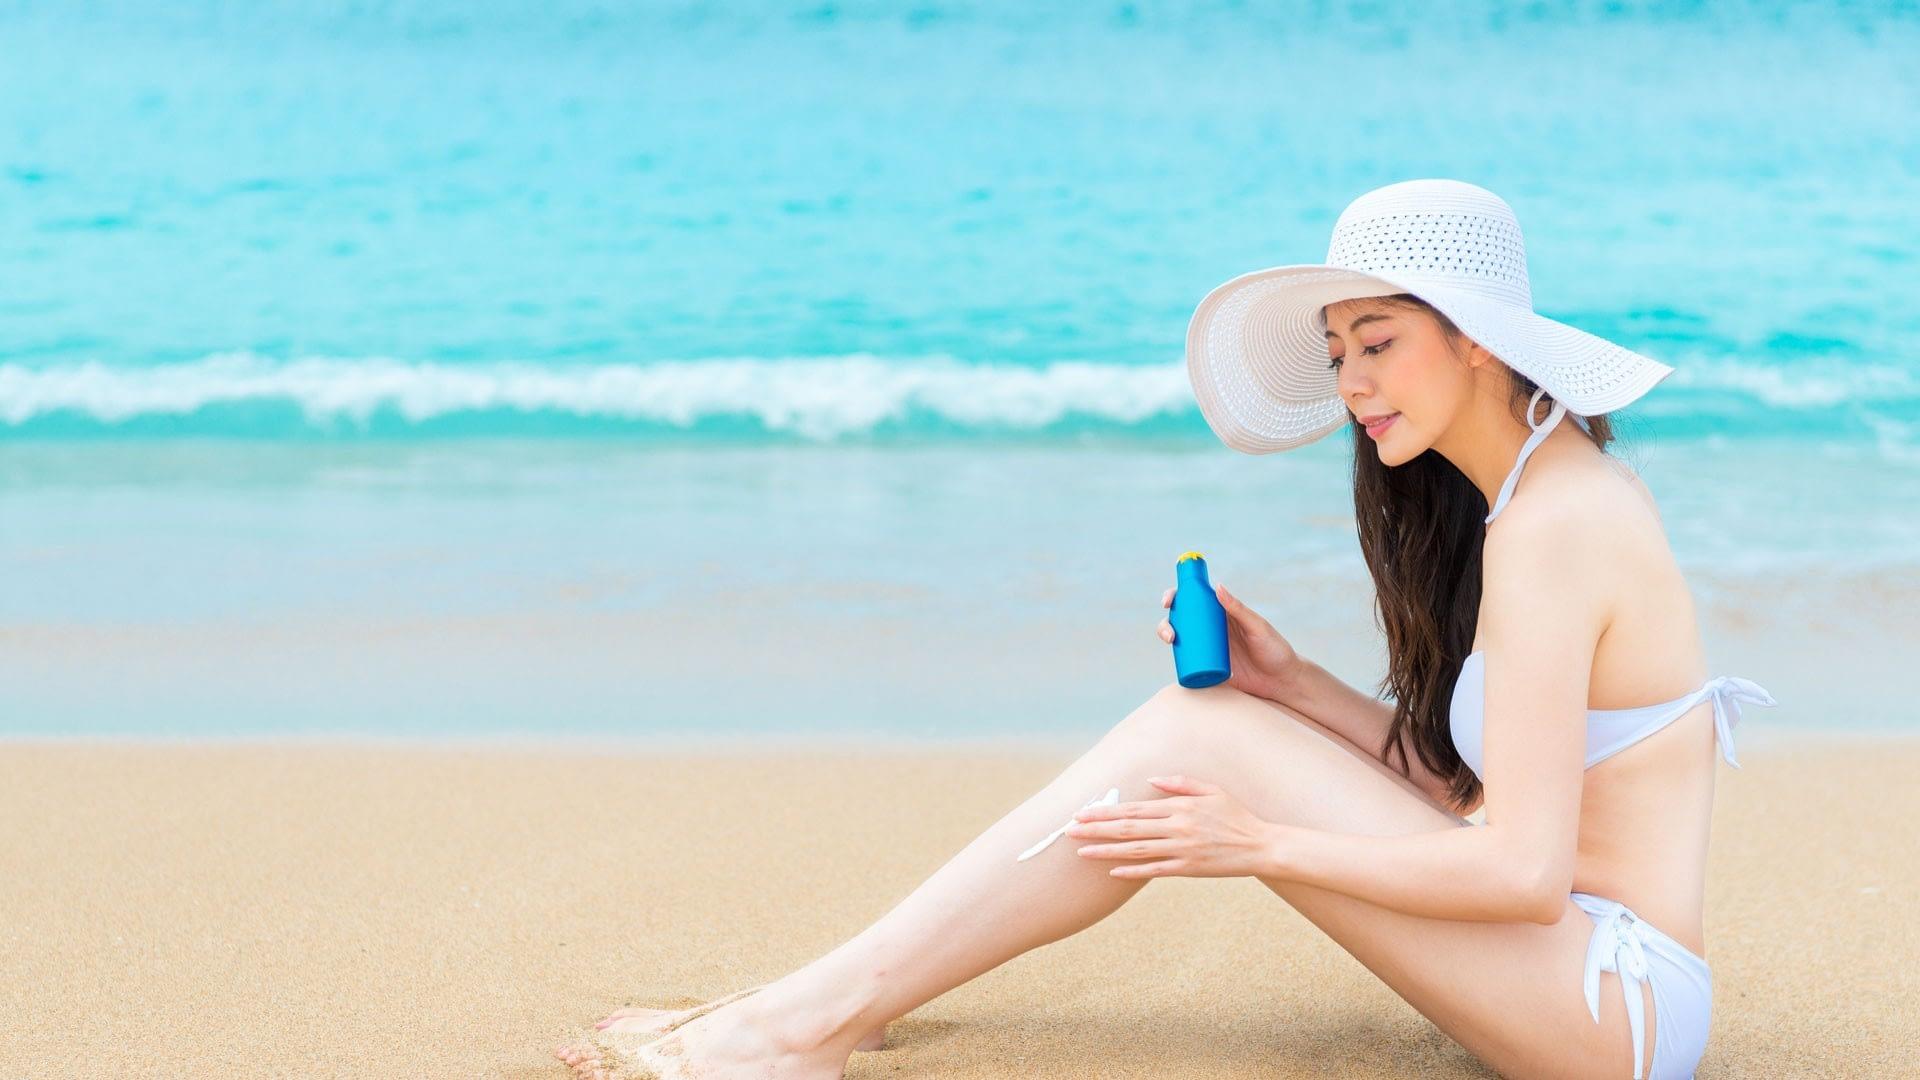 Lady on the beach applying korean sunscreen to her leg